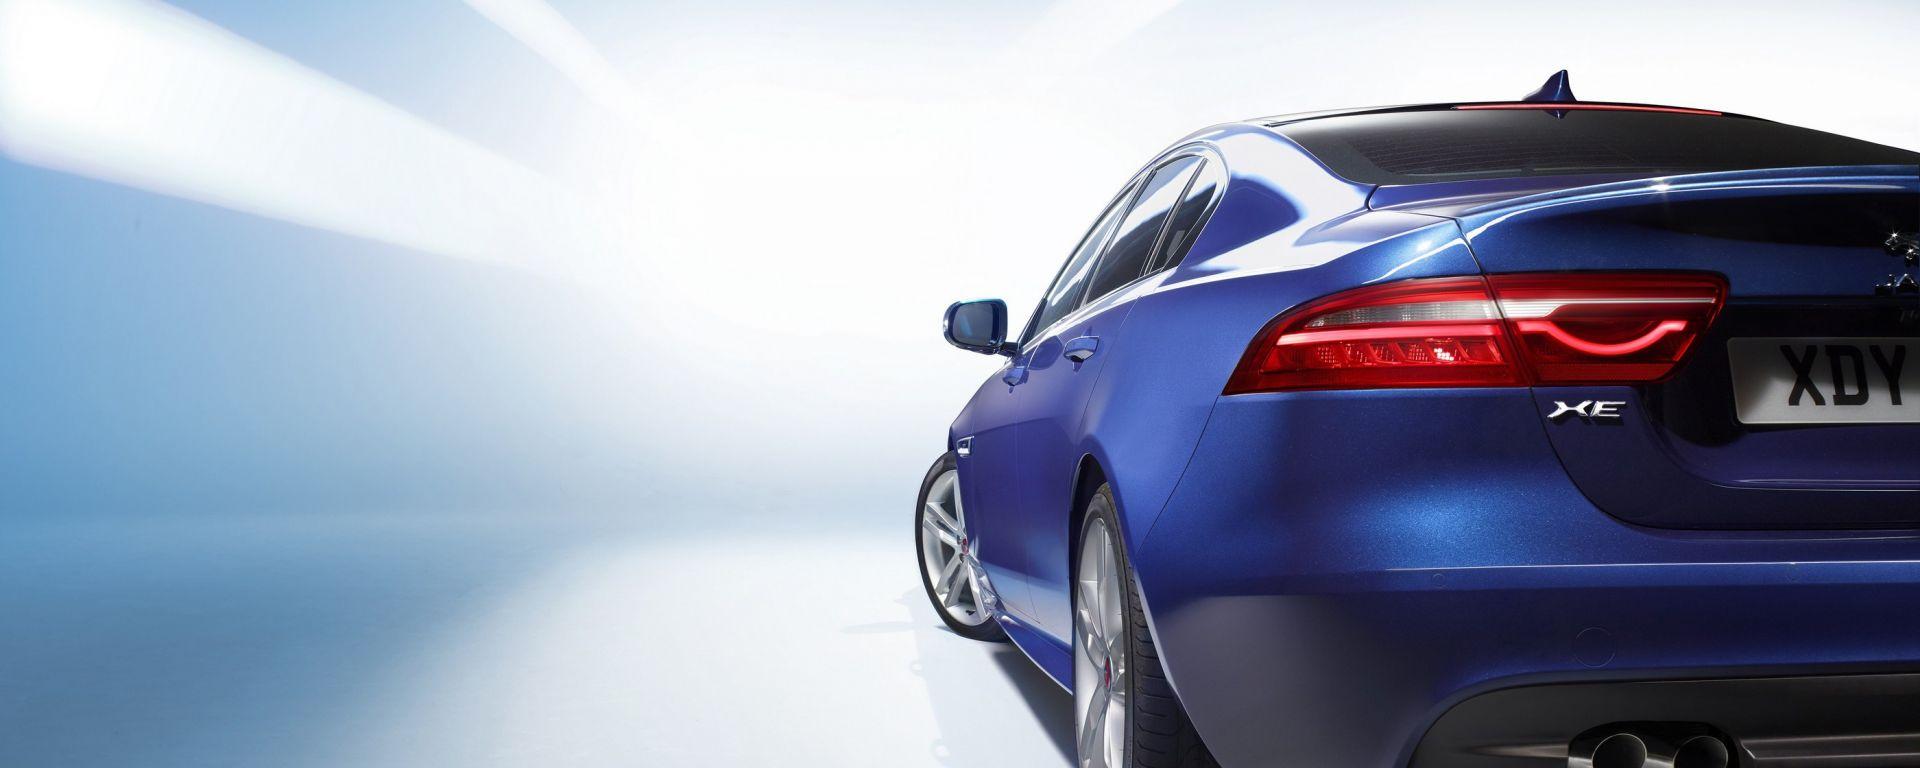 Jaguar XE: nuove immagini